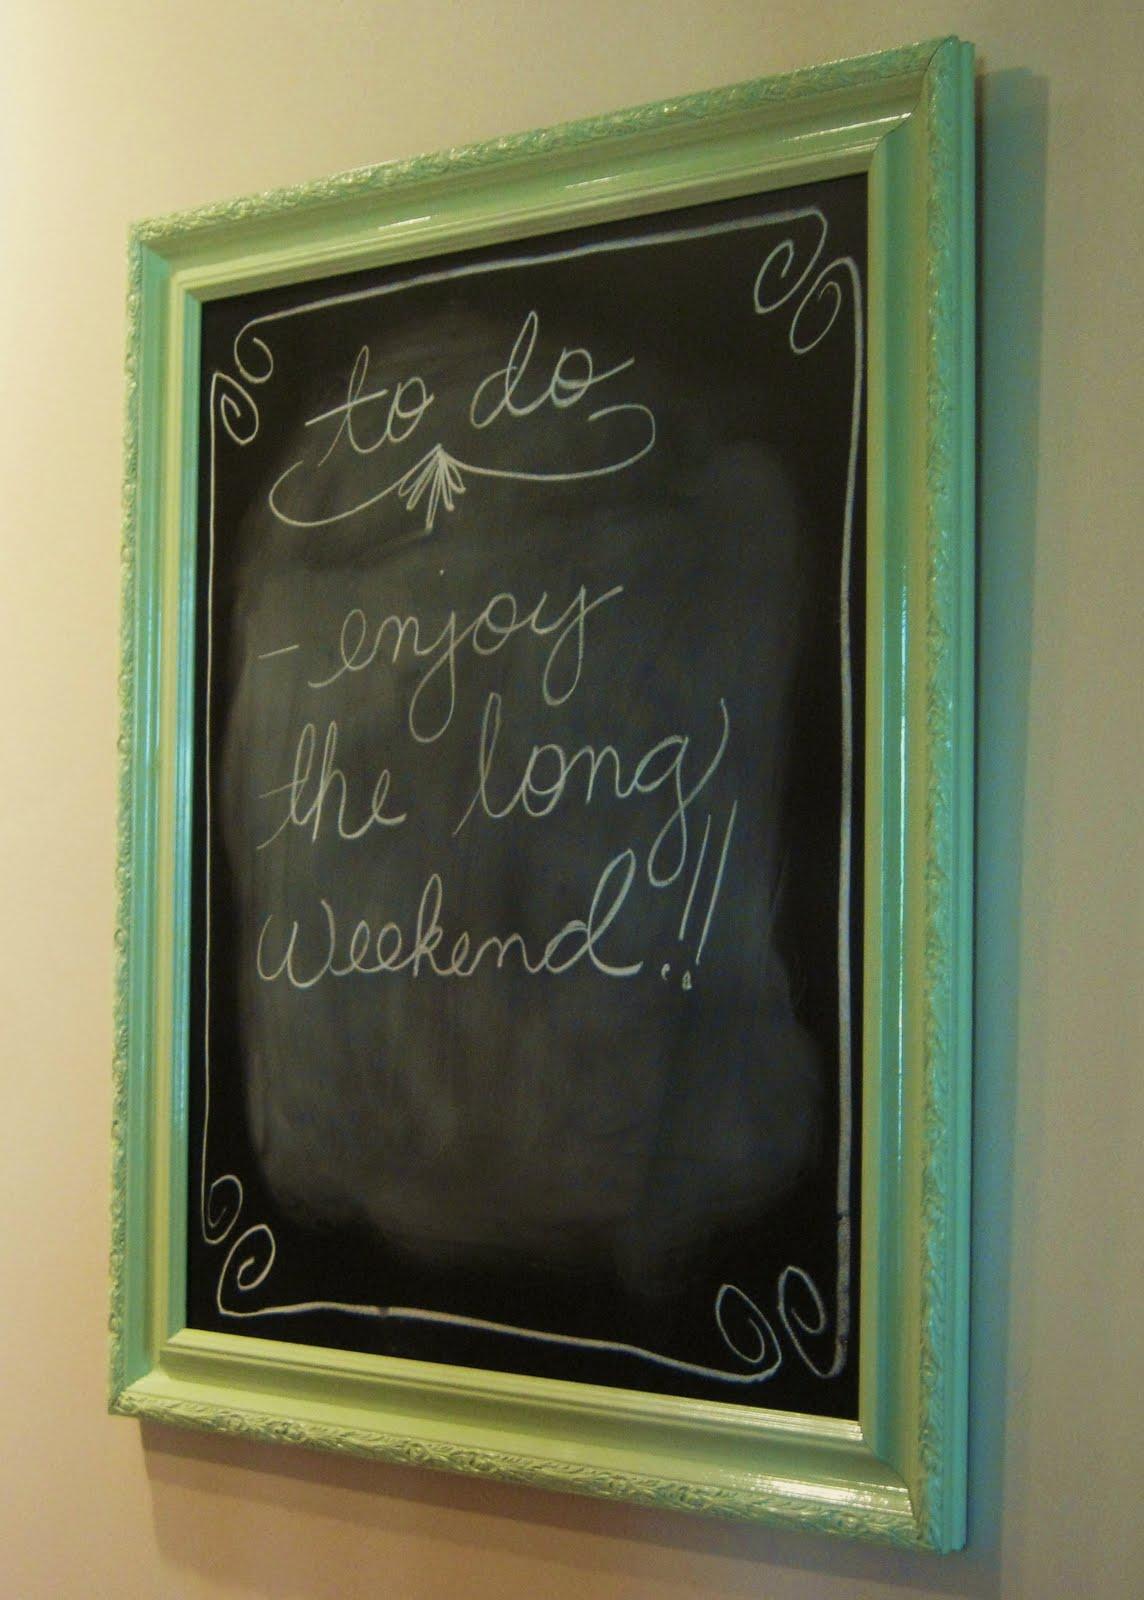 diy framed chalkboard - Diy Framed Chalkboard